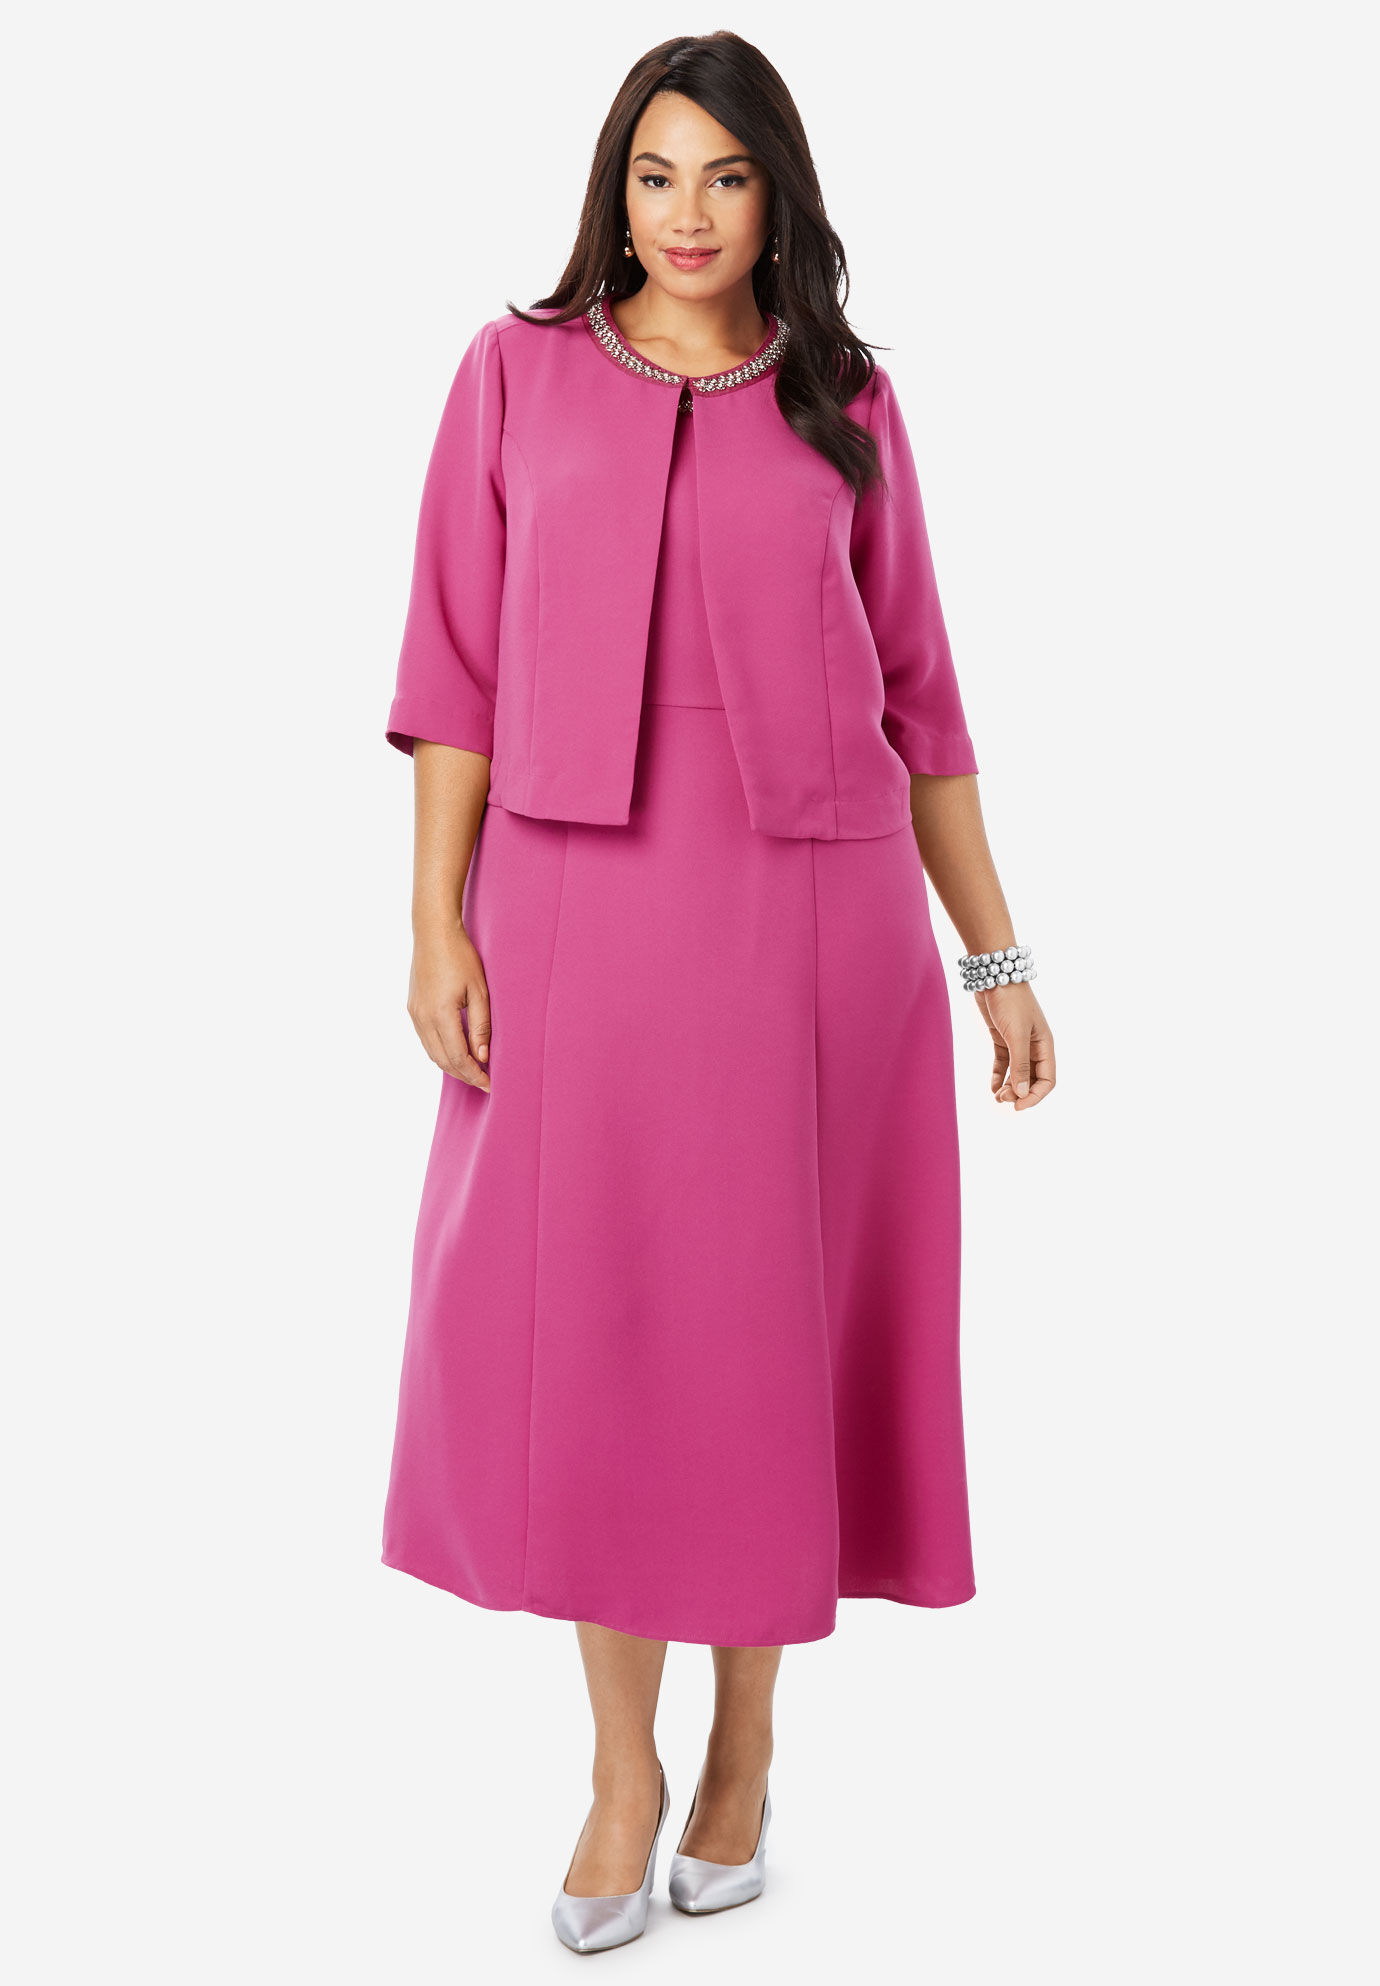 Jacket Formal Dresses for Women